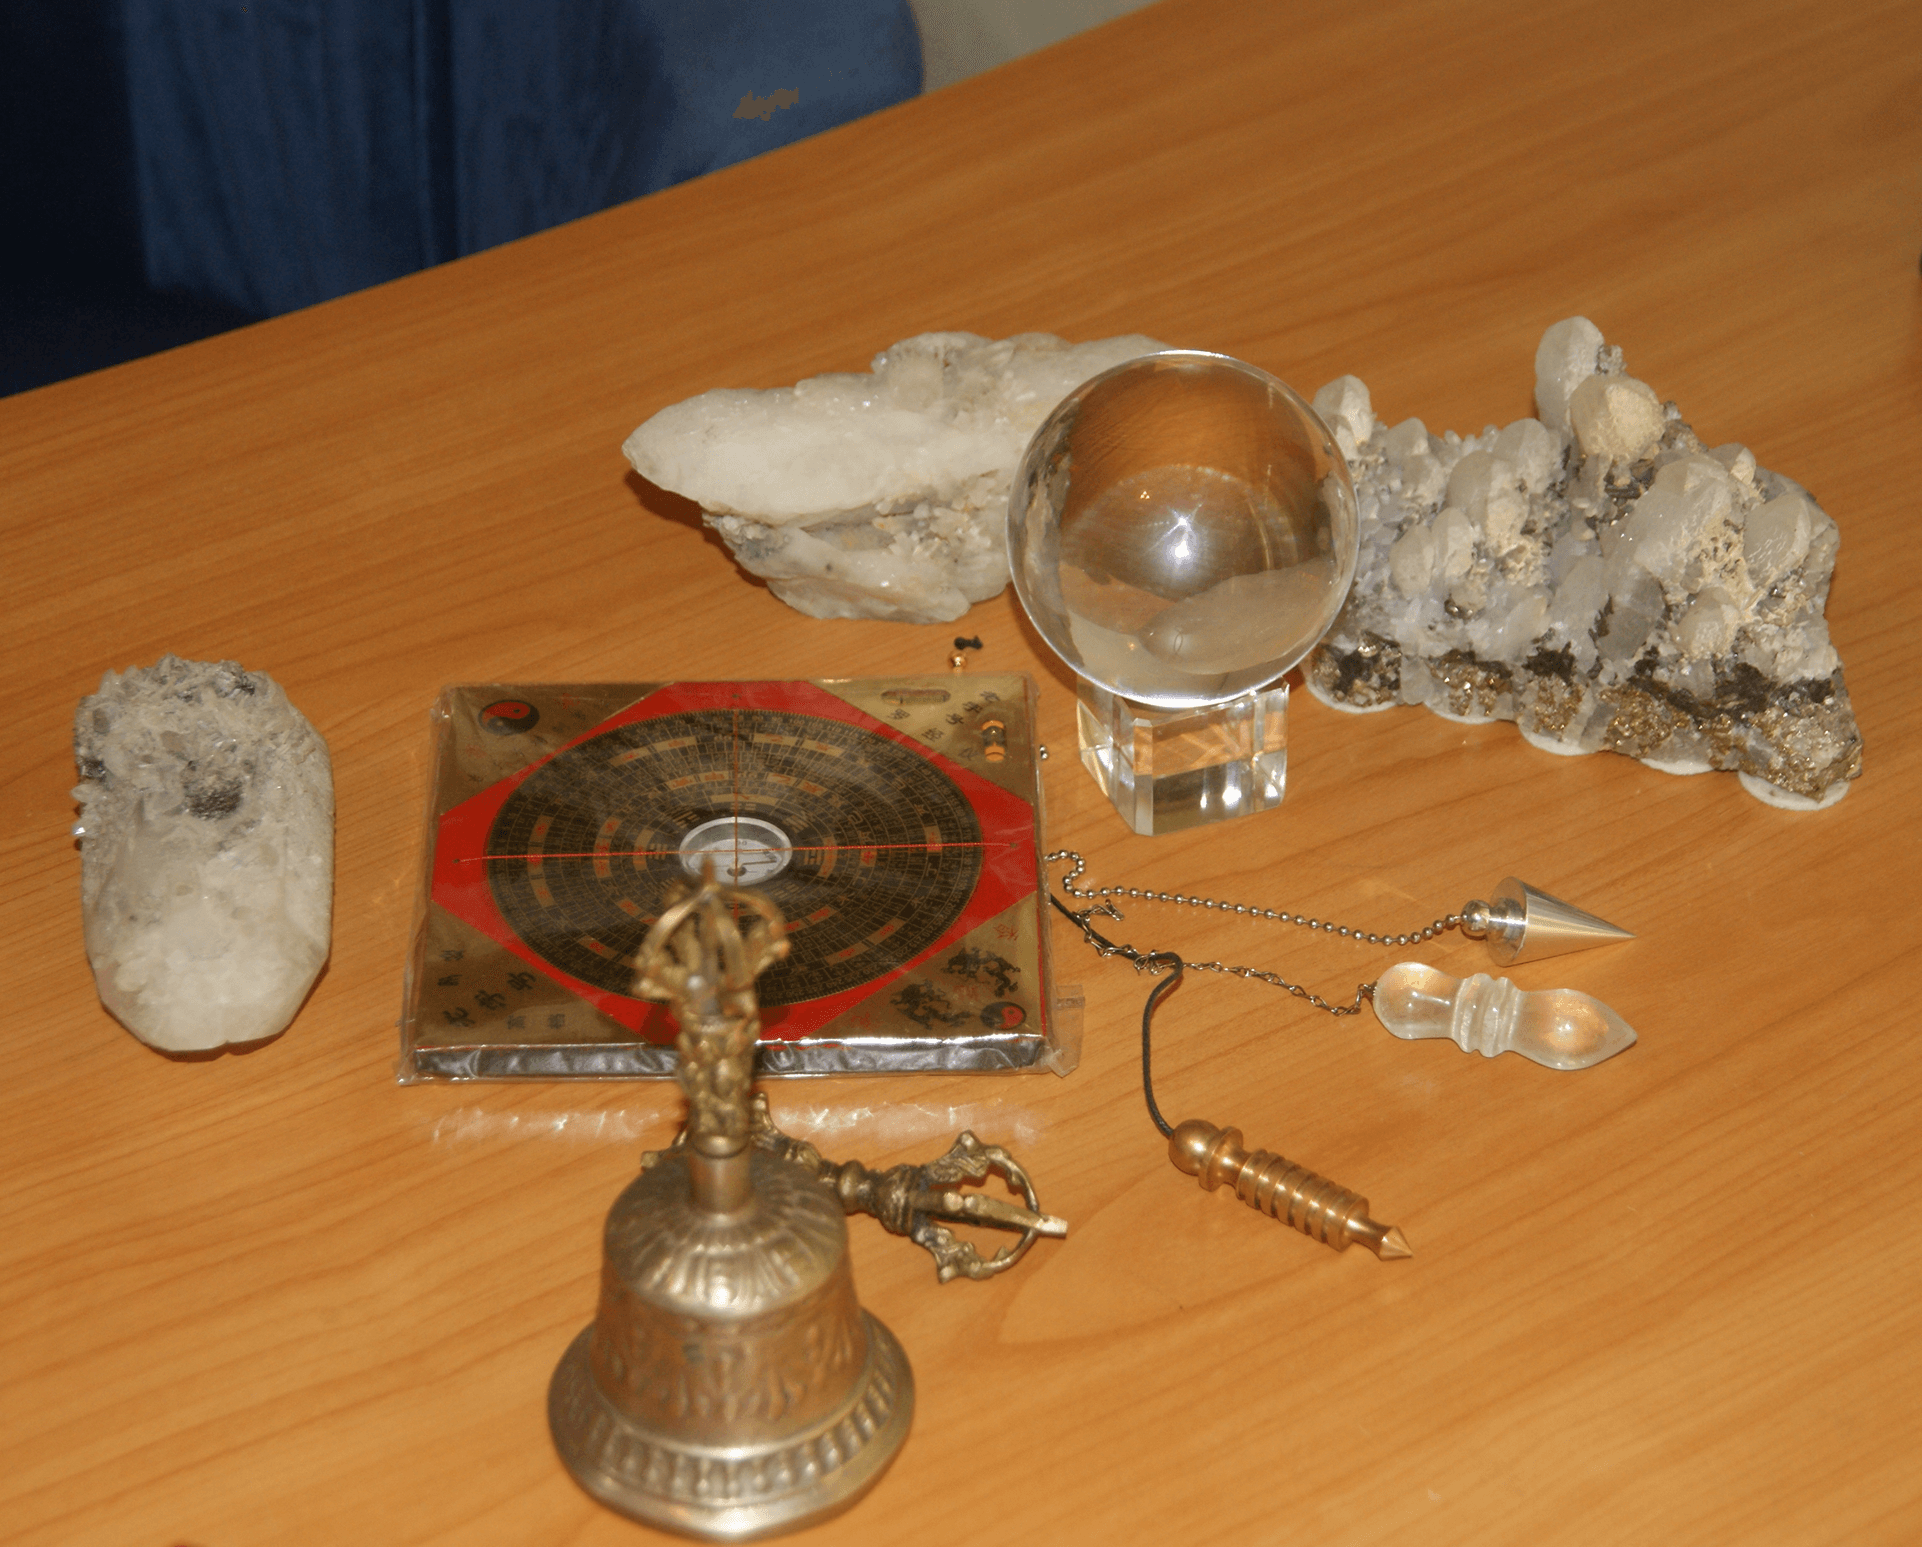 kristali-radiestezia-com